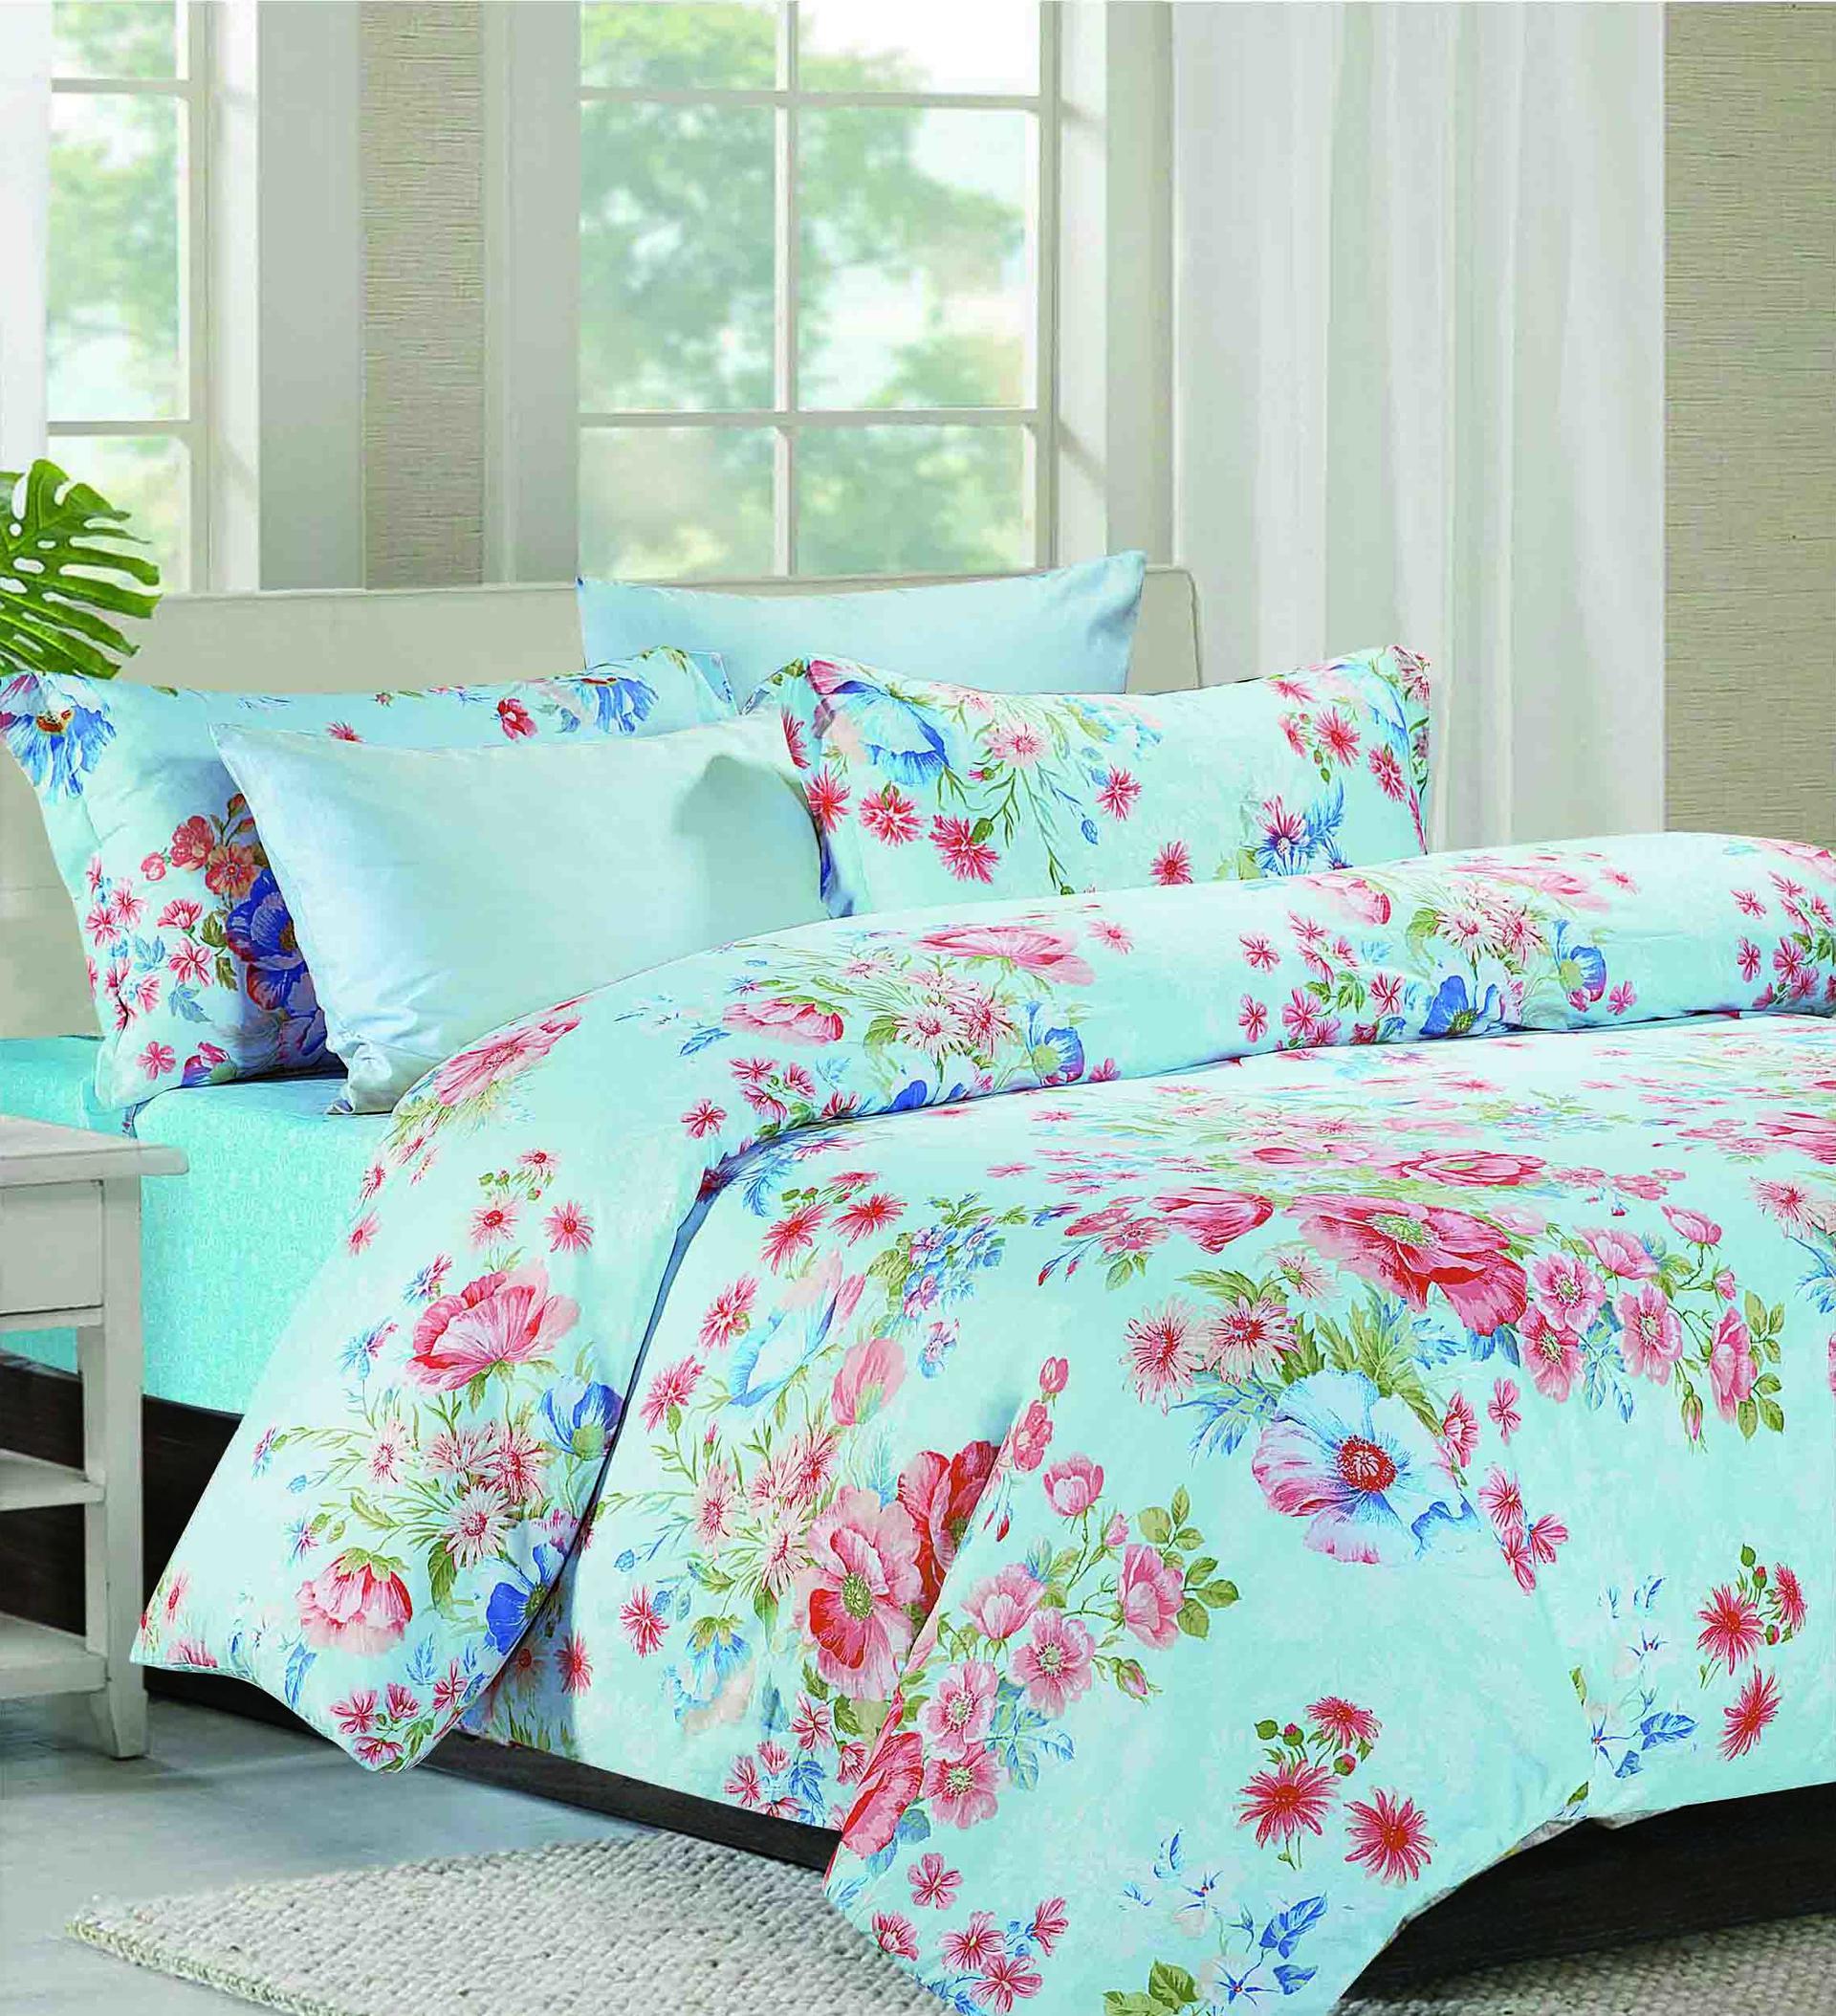 Vivid Floral Patterns Printed Bedding Set   161136